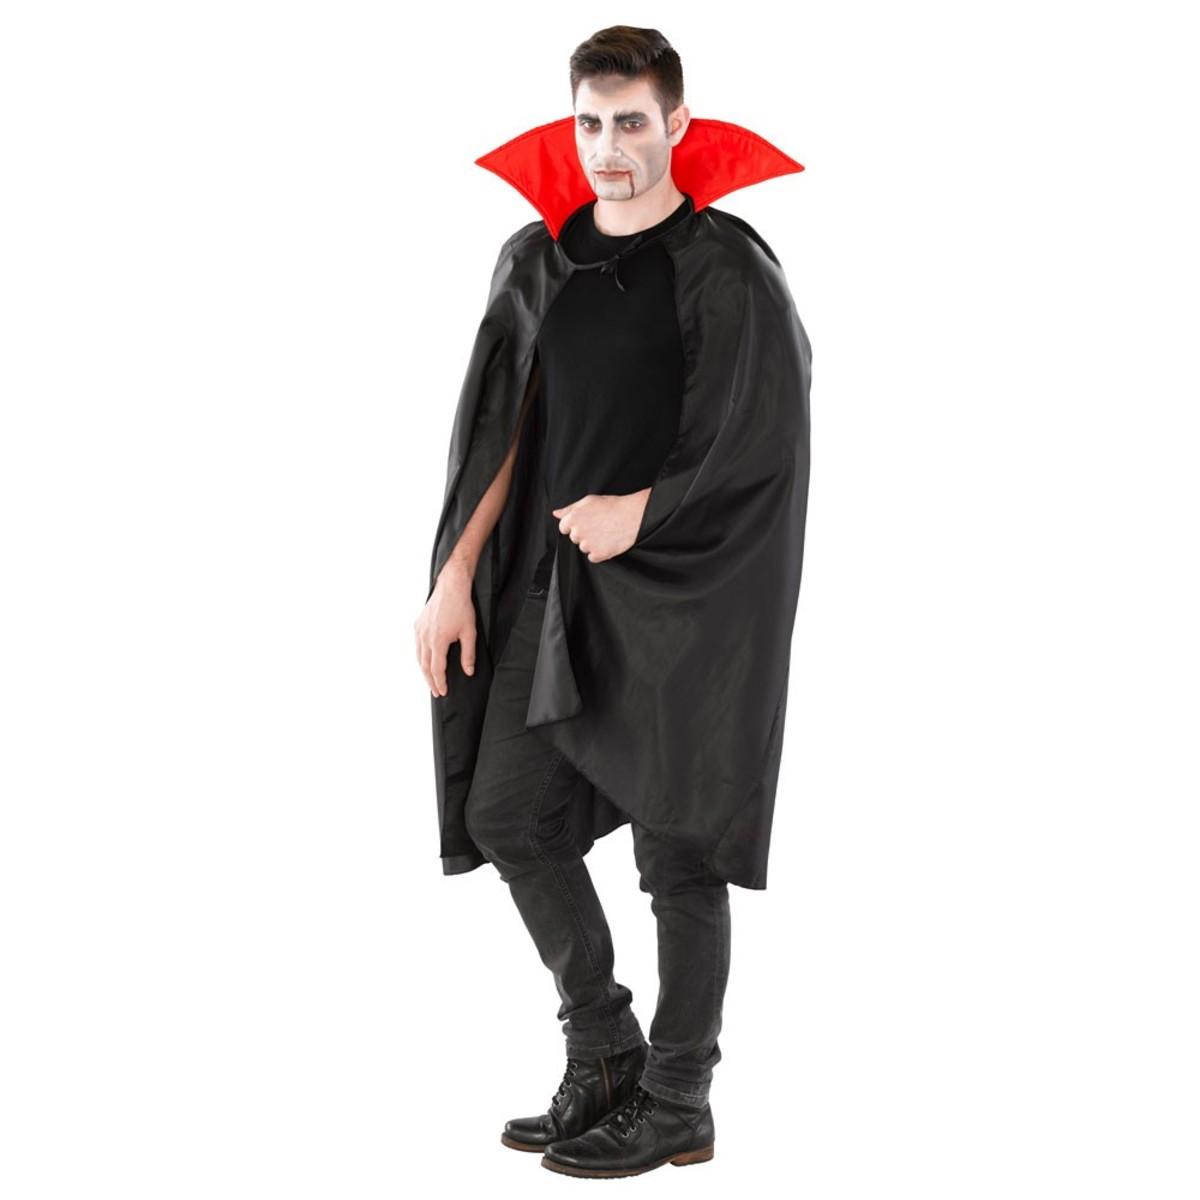 Bild 2 von Dracula Vampir Umhang roter Kragen